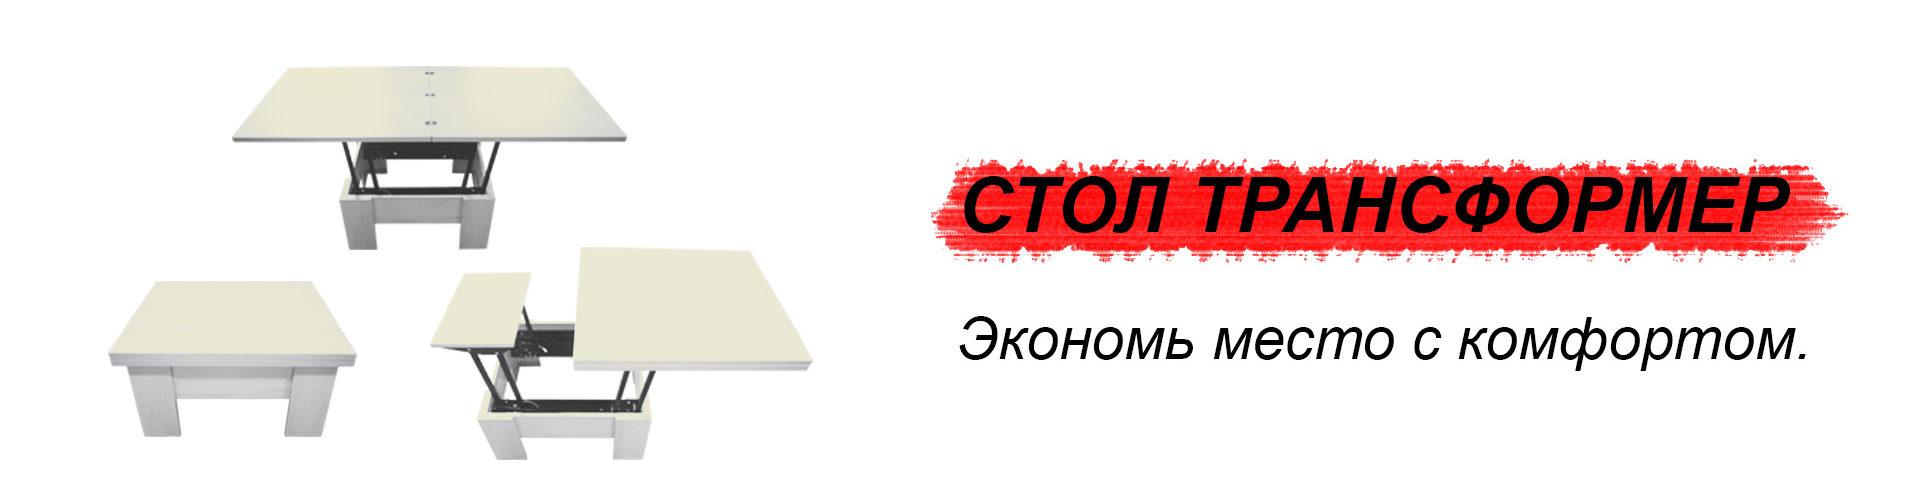 Слайдер Стол Трансформер